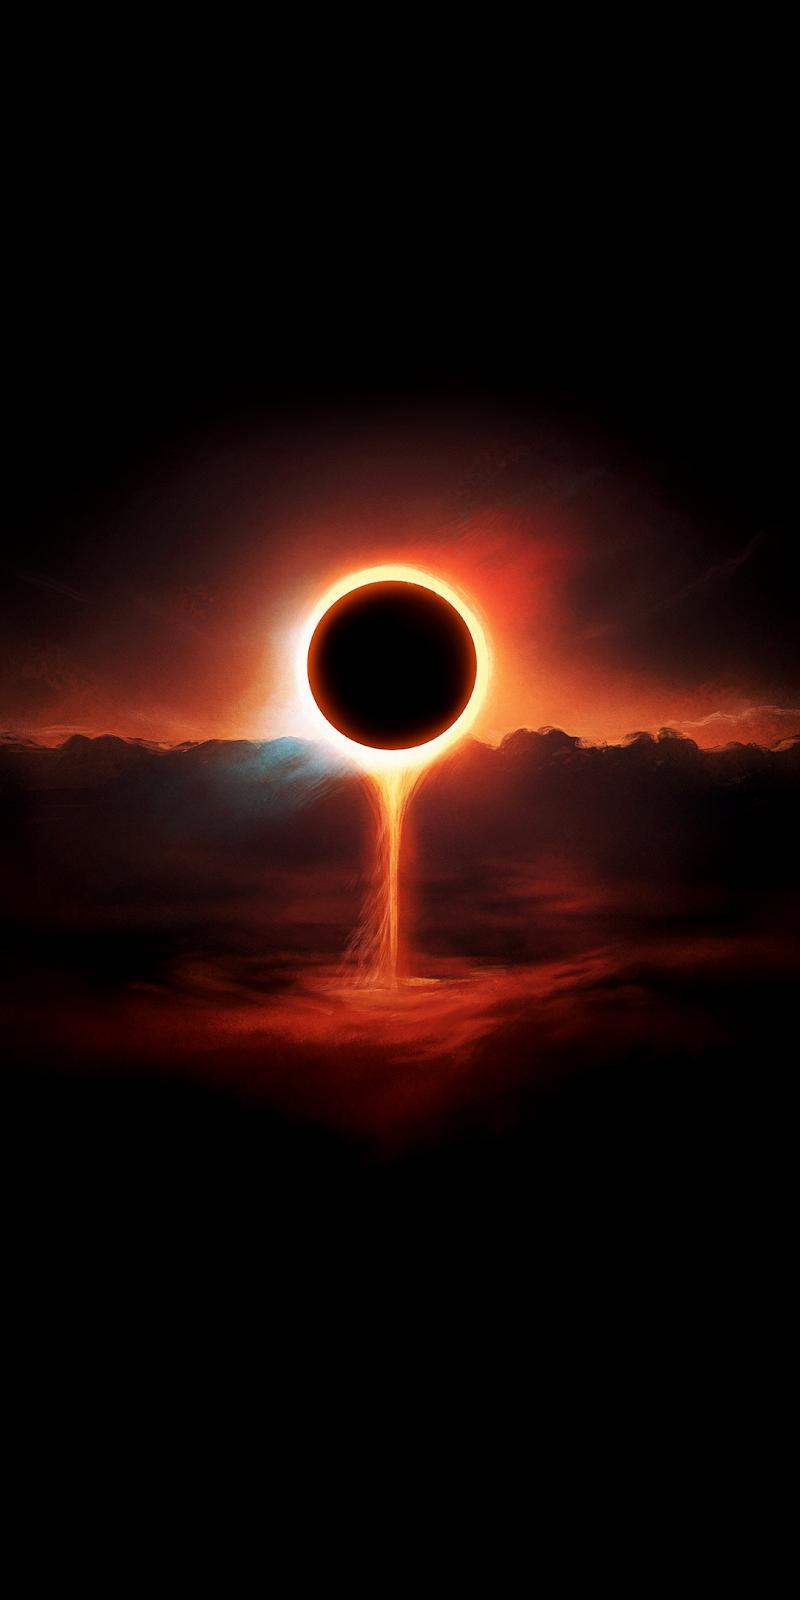 Eclipse wallpaper